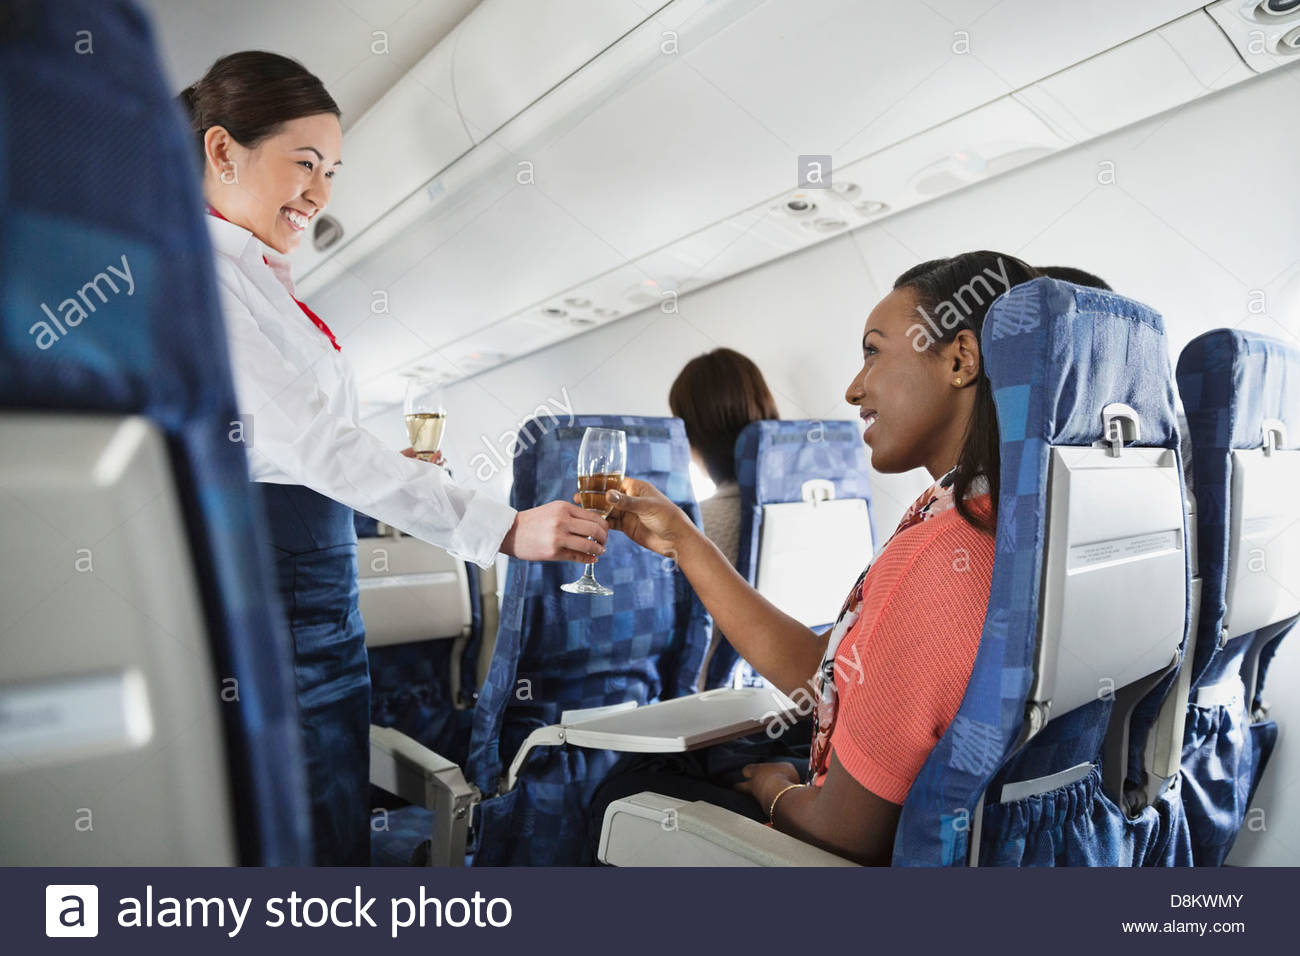 Flight attendant serving champagne to passenger - Stock Image